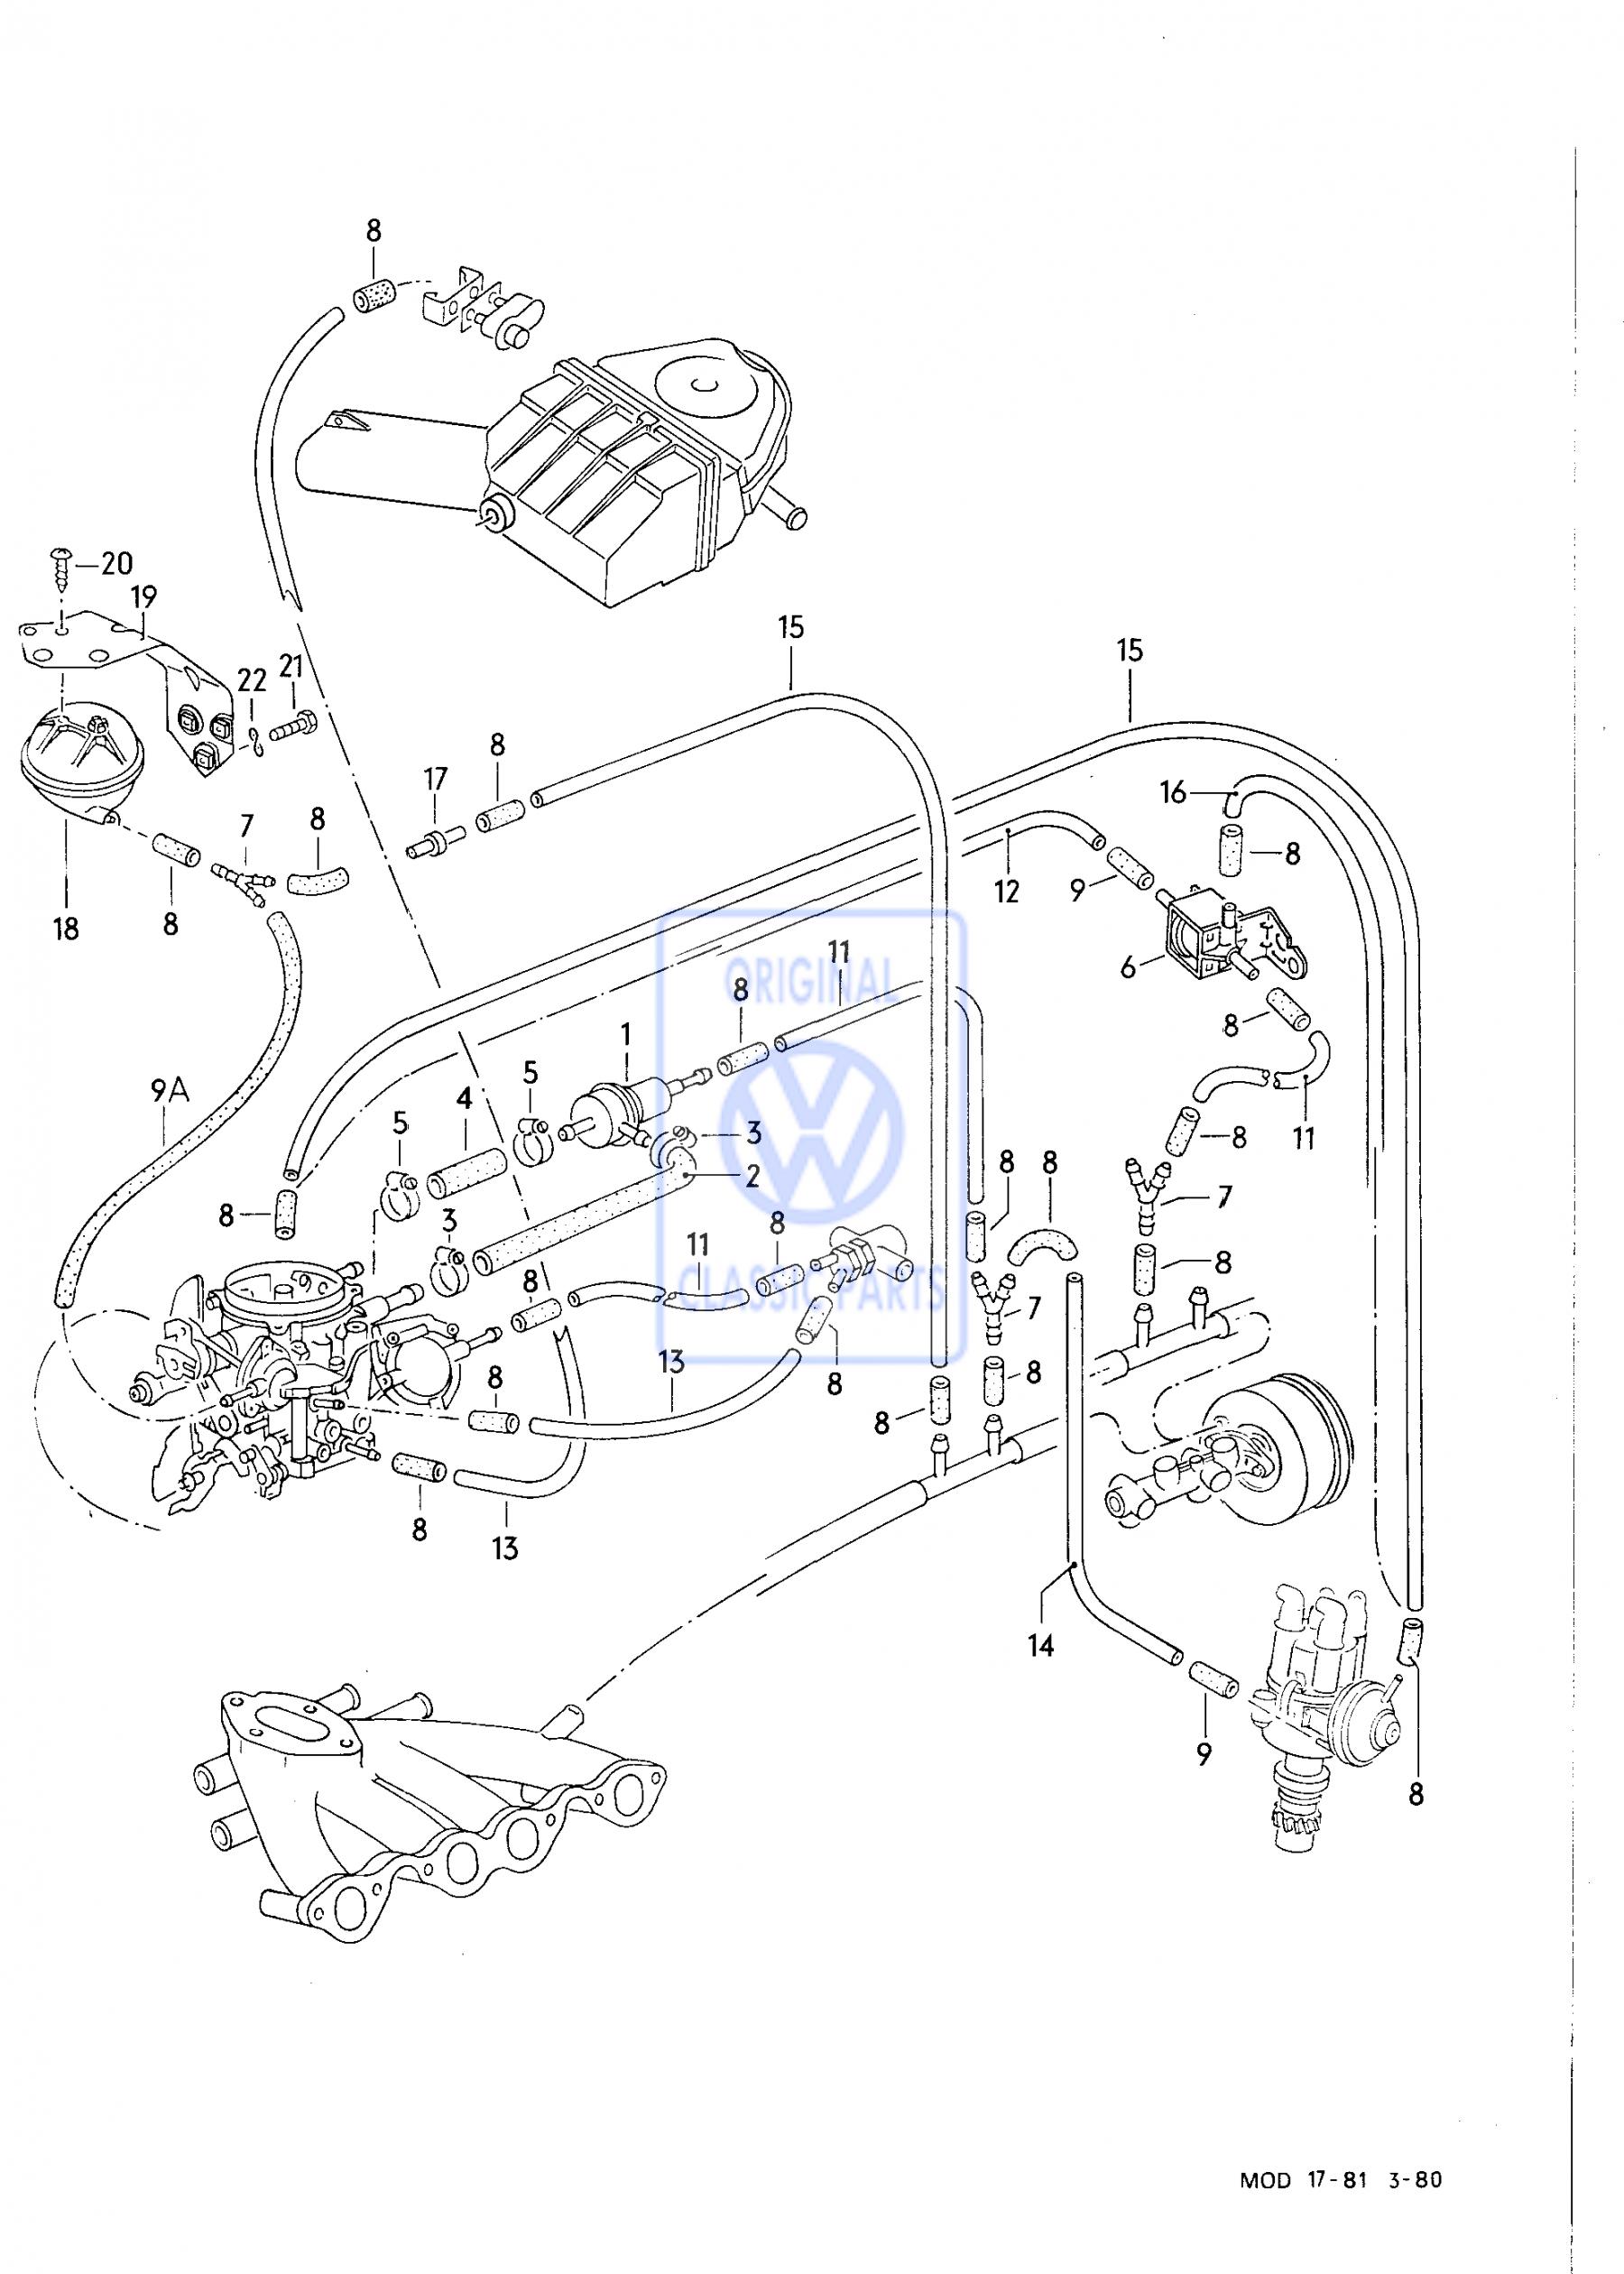 plug drawing at getdrawings free for personal use plug drawing 7-Way Round Trailer Wiring Diagram 1800x2520 plug